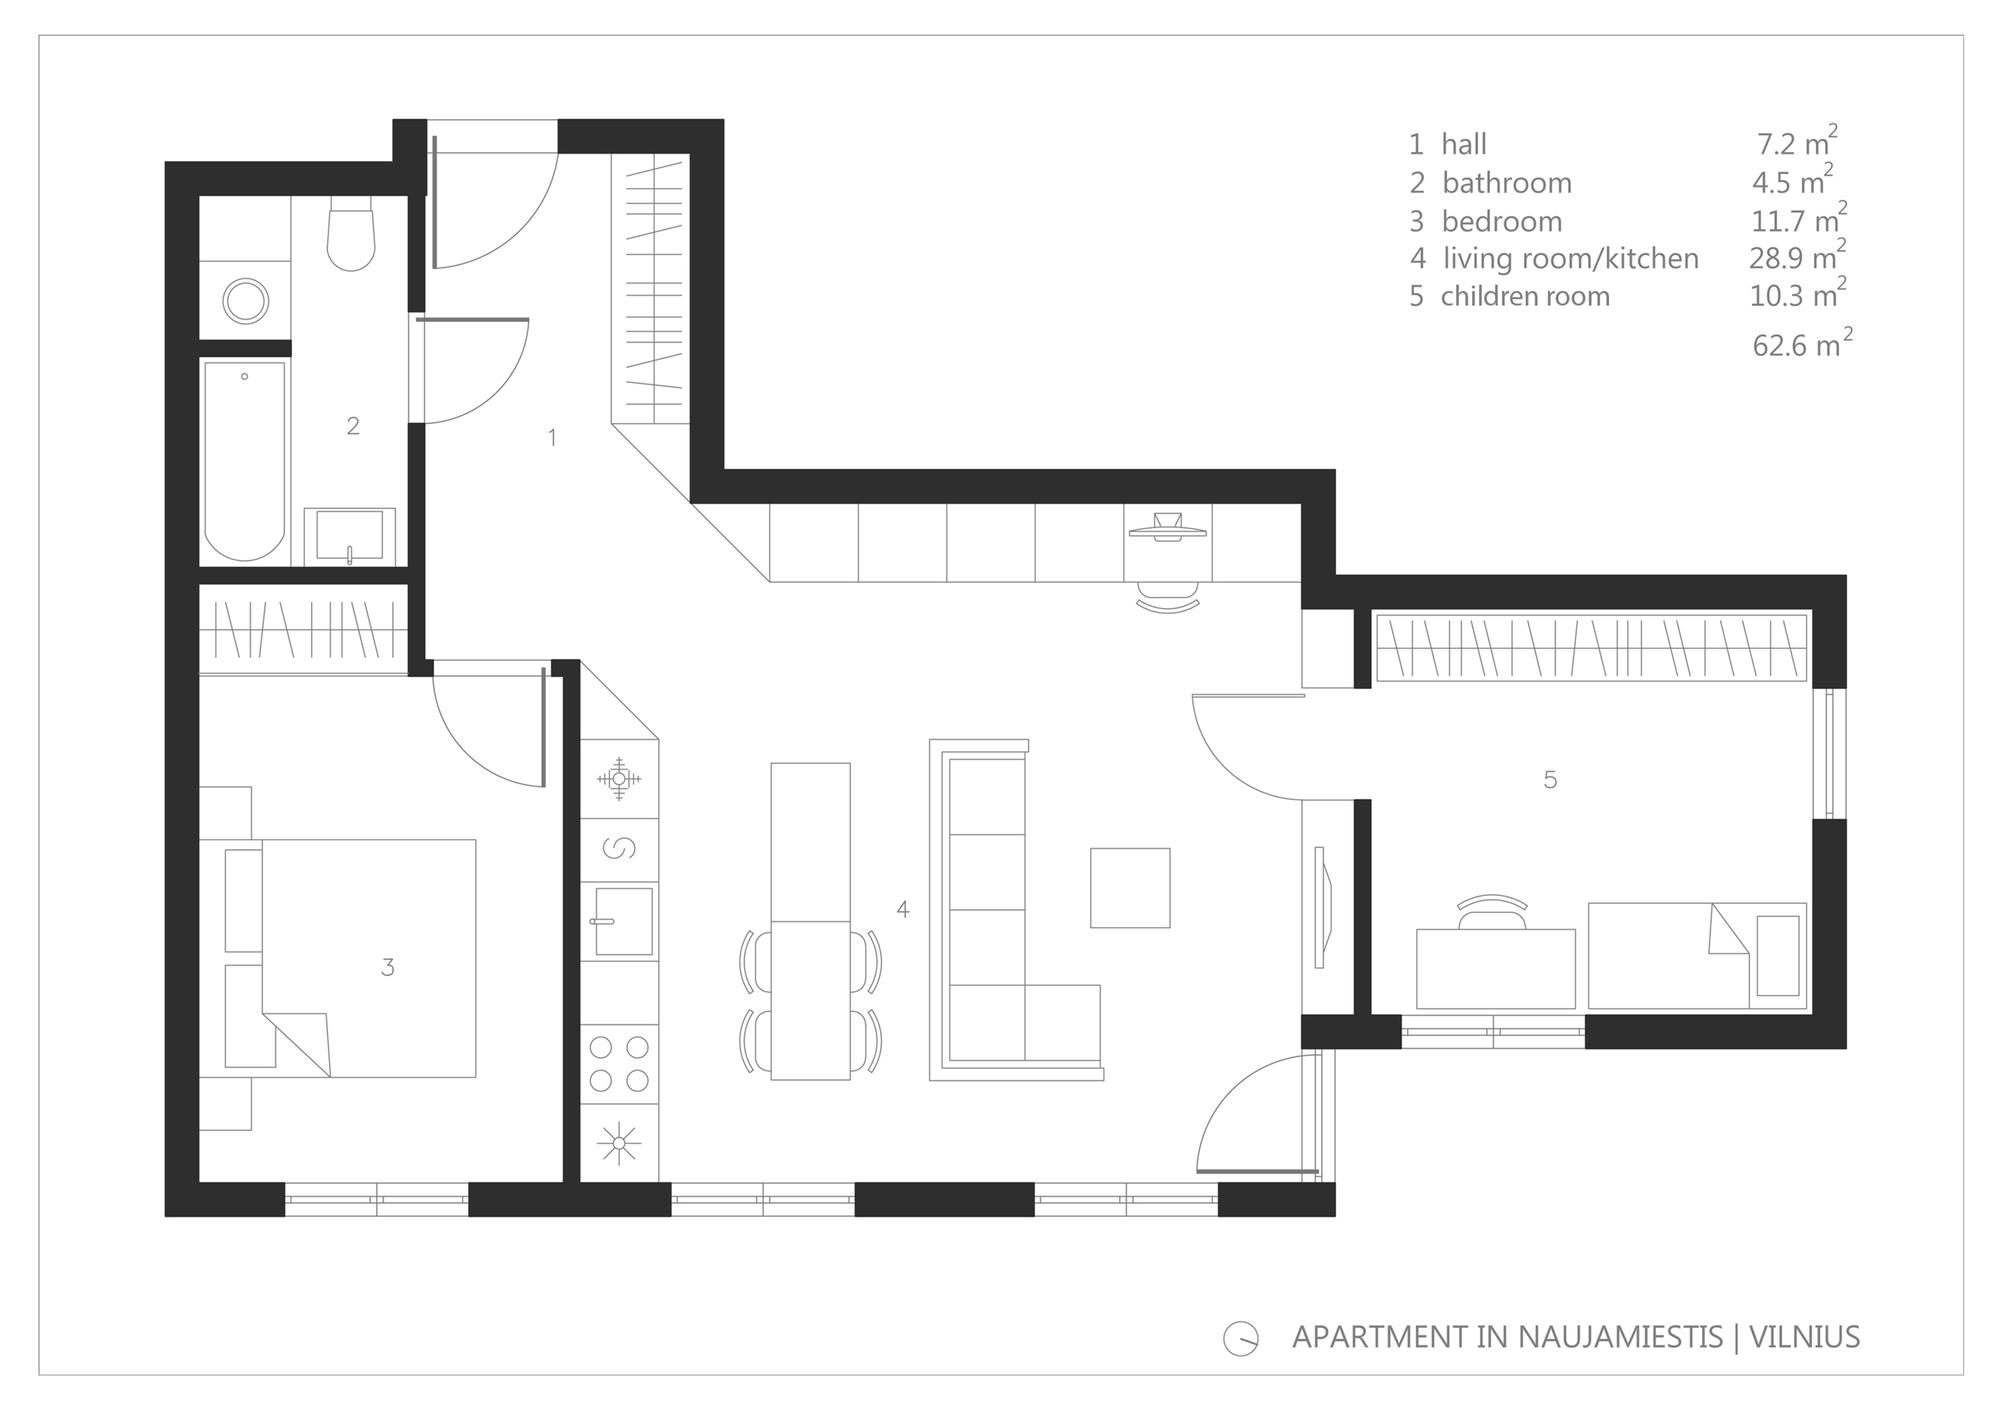 loft above garage ideas - Small Apartments Petits appartements